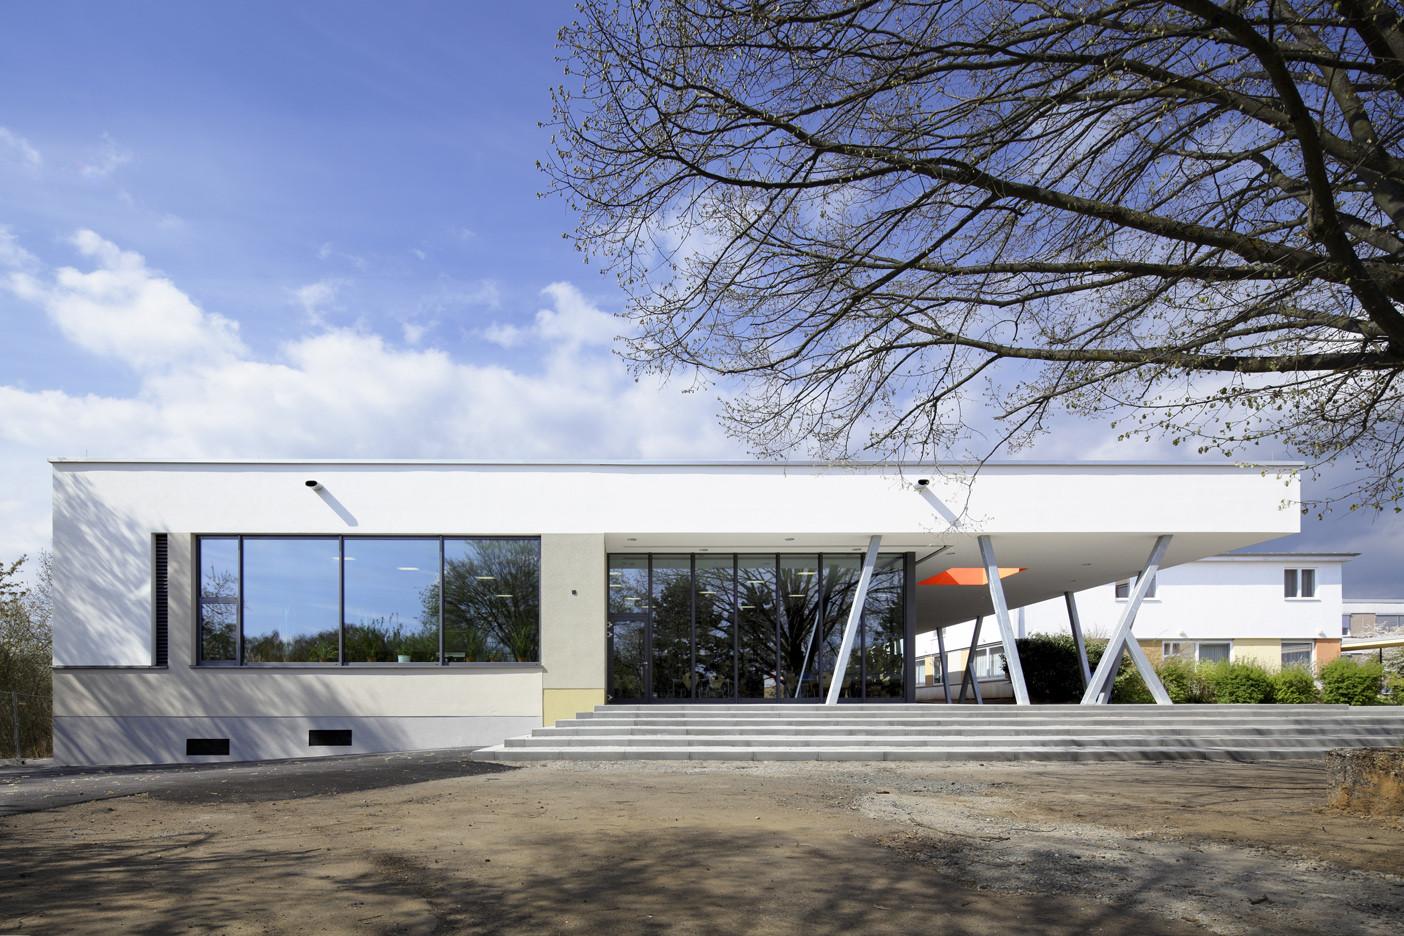 Friedrich-Ebert-Schule / kreiling rosner architekten